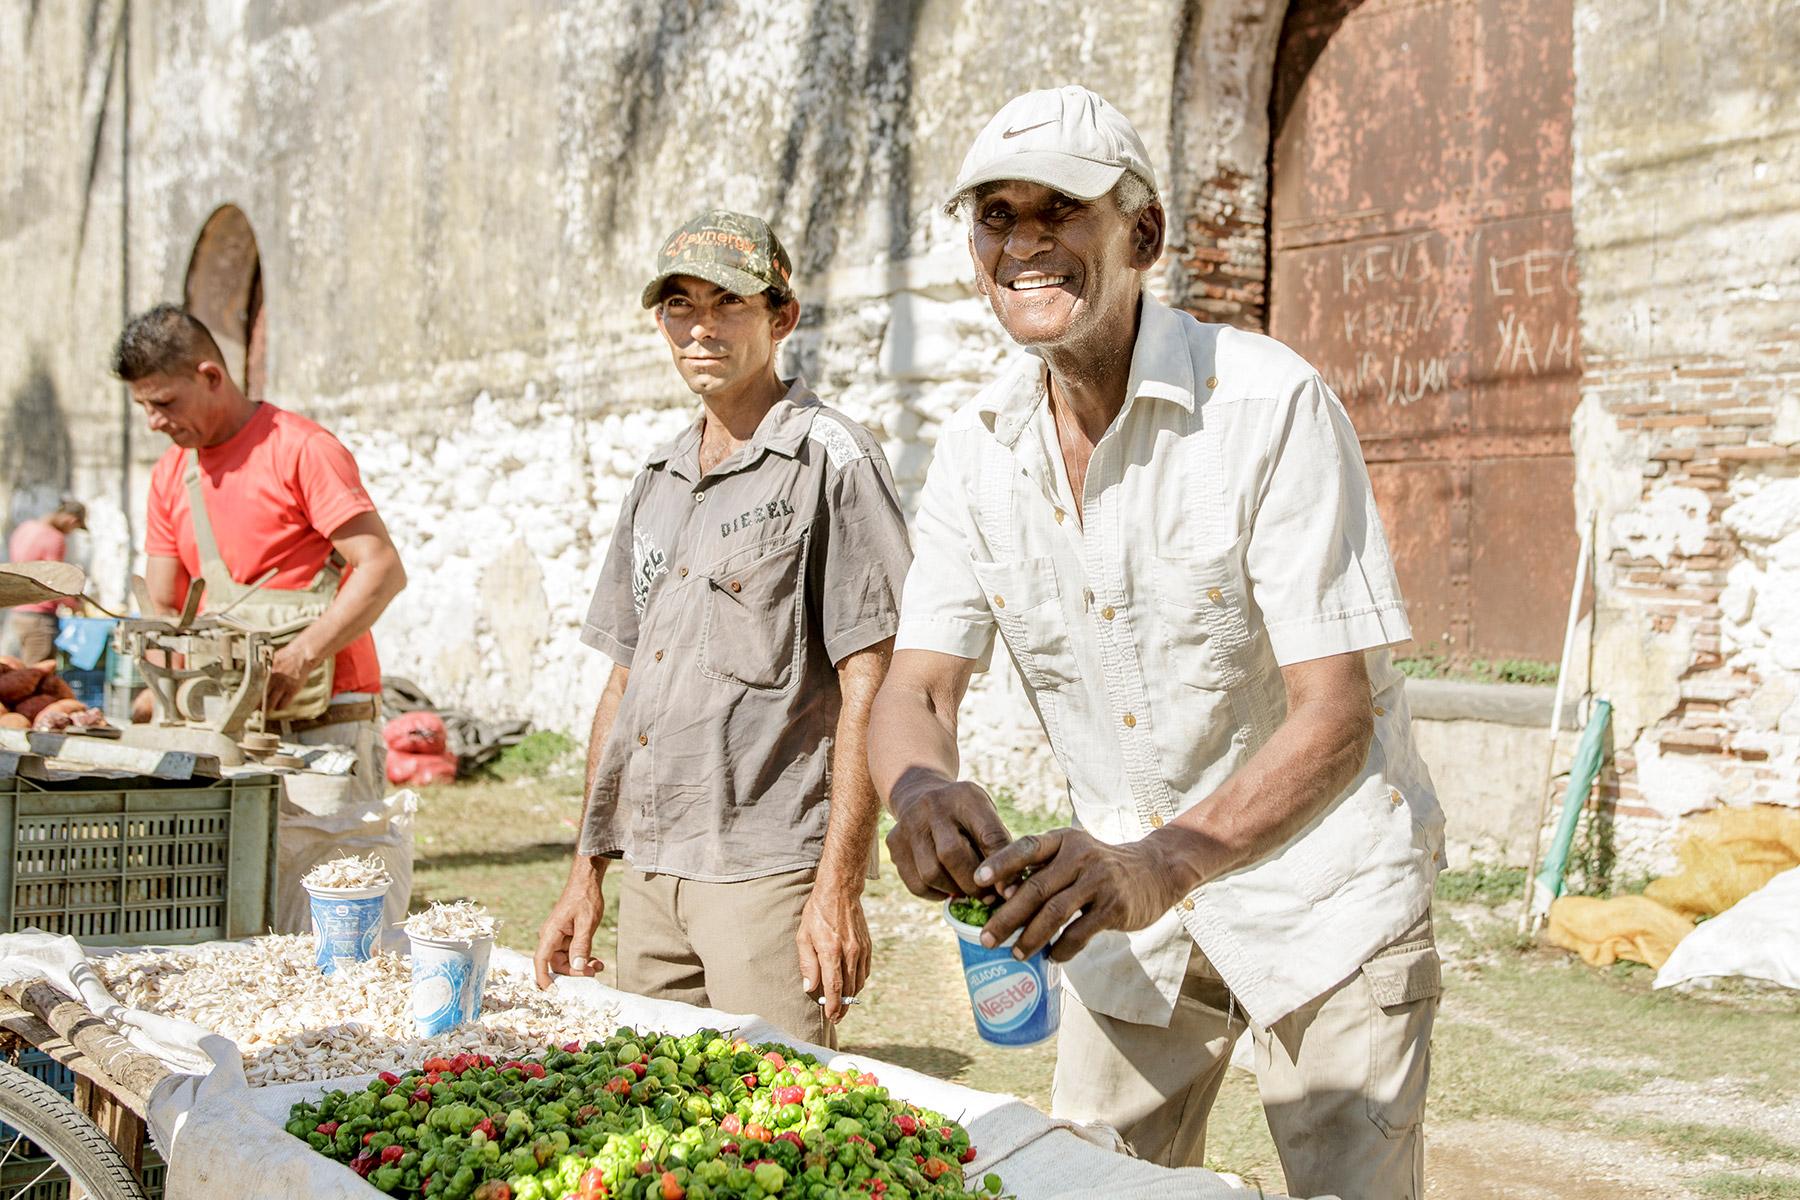 Miami_lifestyle_photography_david_gonzalez_streets_of_Cuba_happy_farmer.jpg